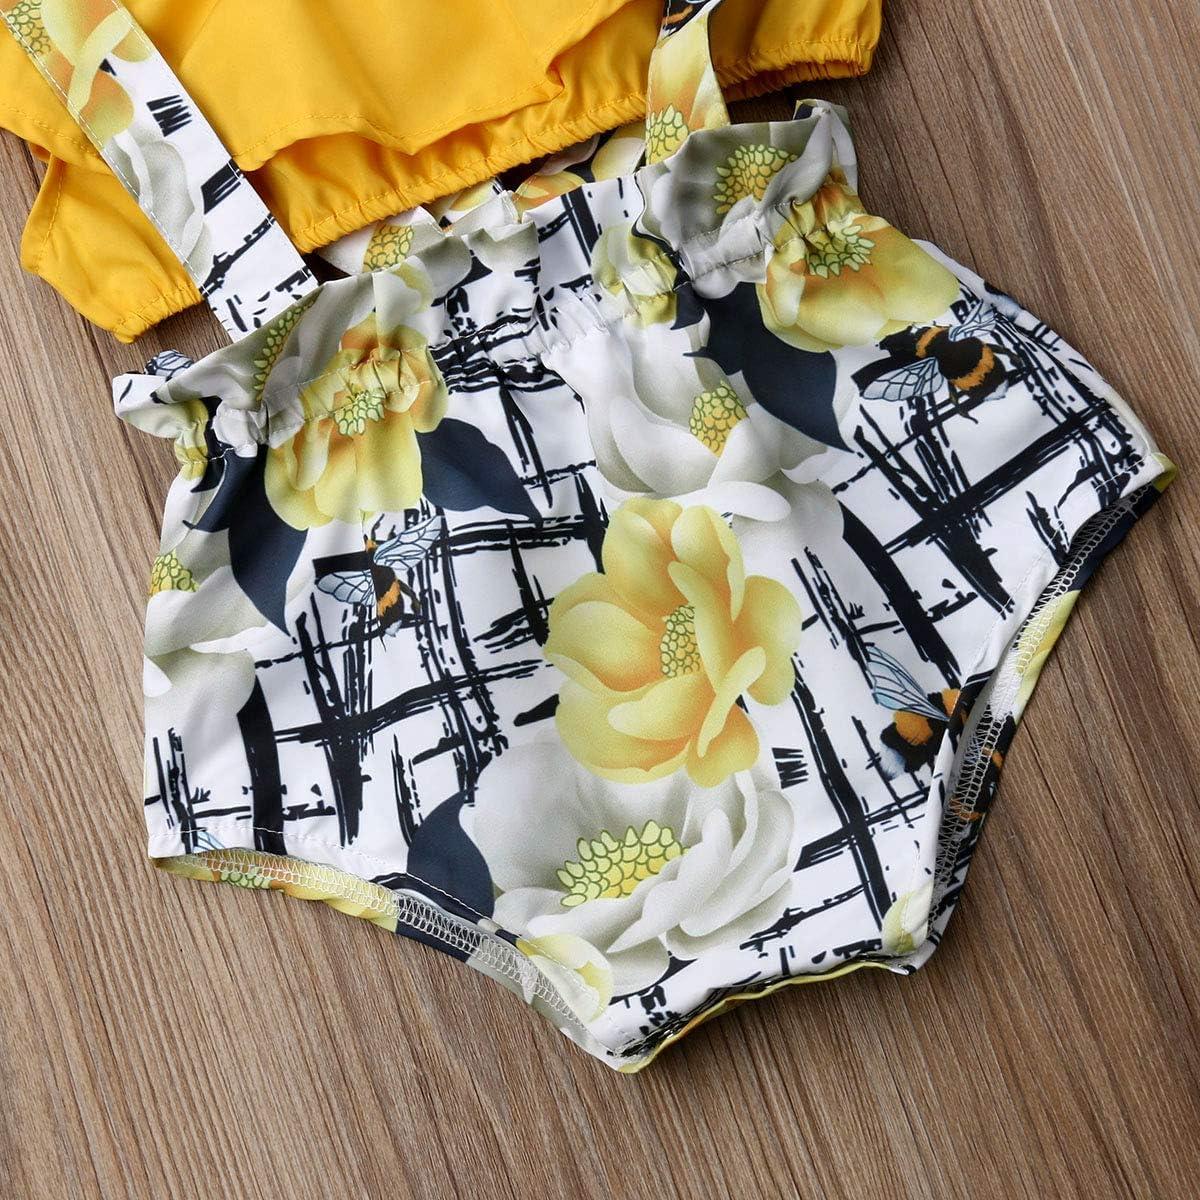 2Pcs//Set Infant Baby Girl Summer Outfits Crop Top+Floral Suspender Overalls Romper Jumpsuit PP Pants 3-18M